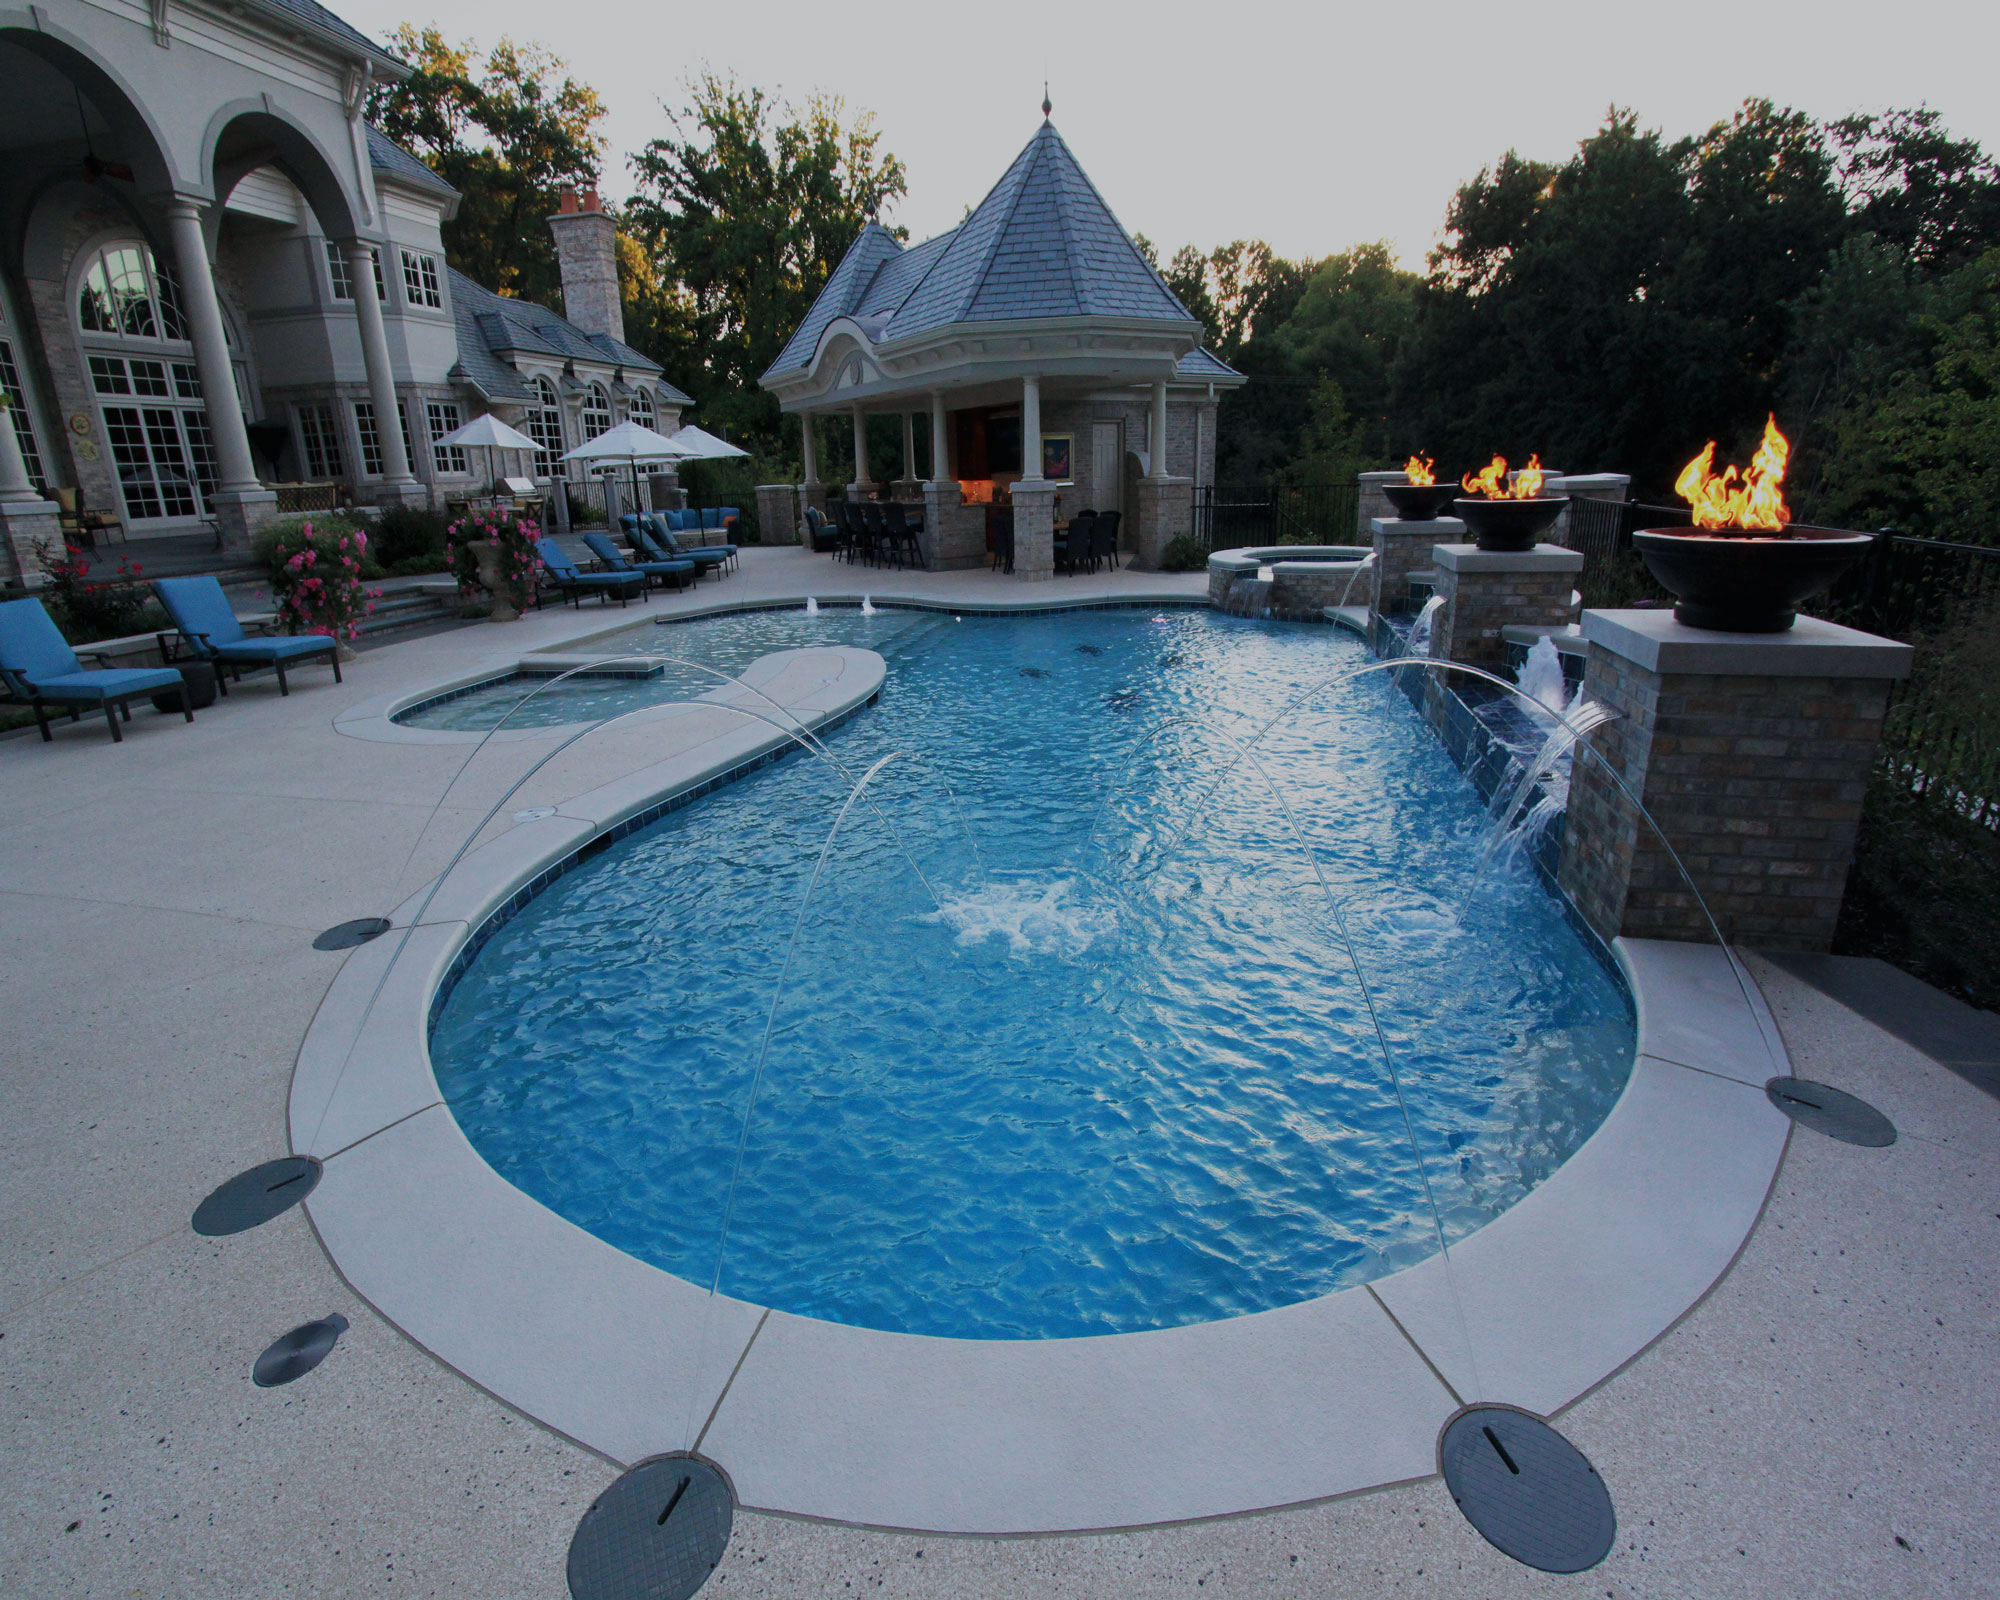 Prestige Pools & Spas - St. Louis Pools | Hot Tubs | Swim Spas